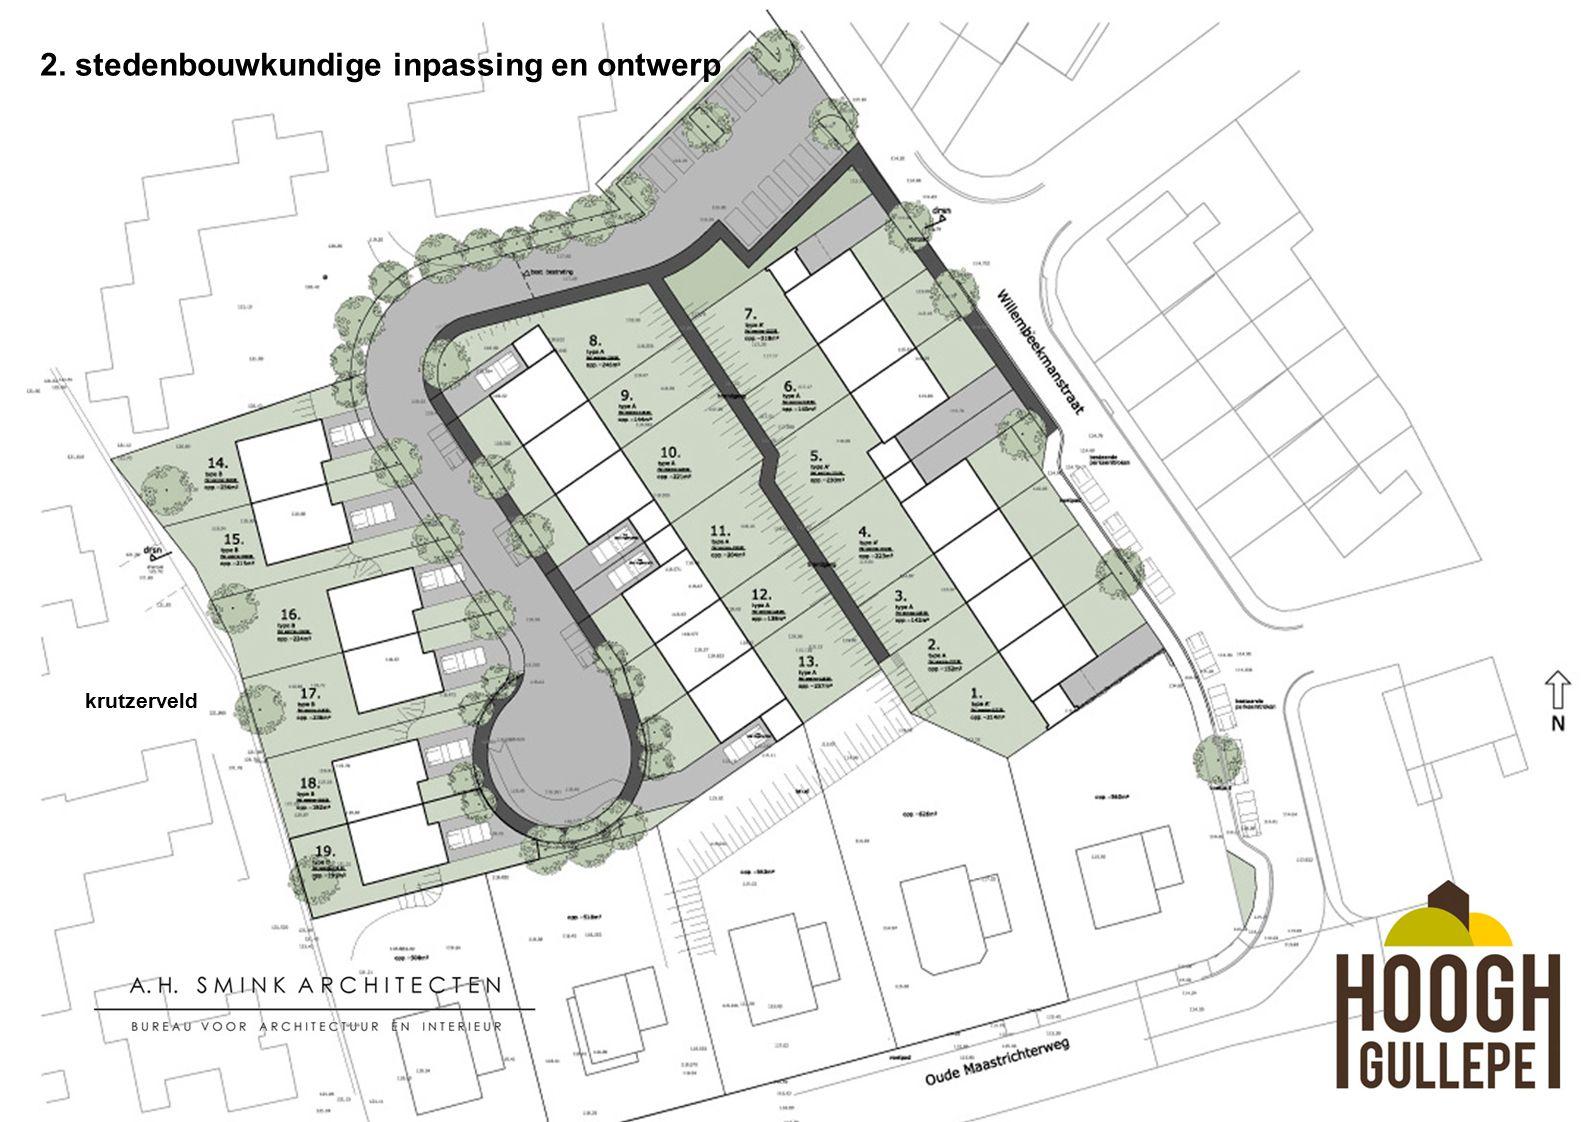 2. stedenbouwkundige inpassing en ontwerp krutzerveld